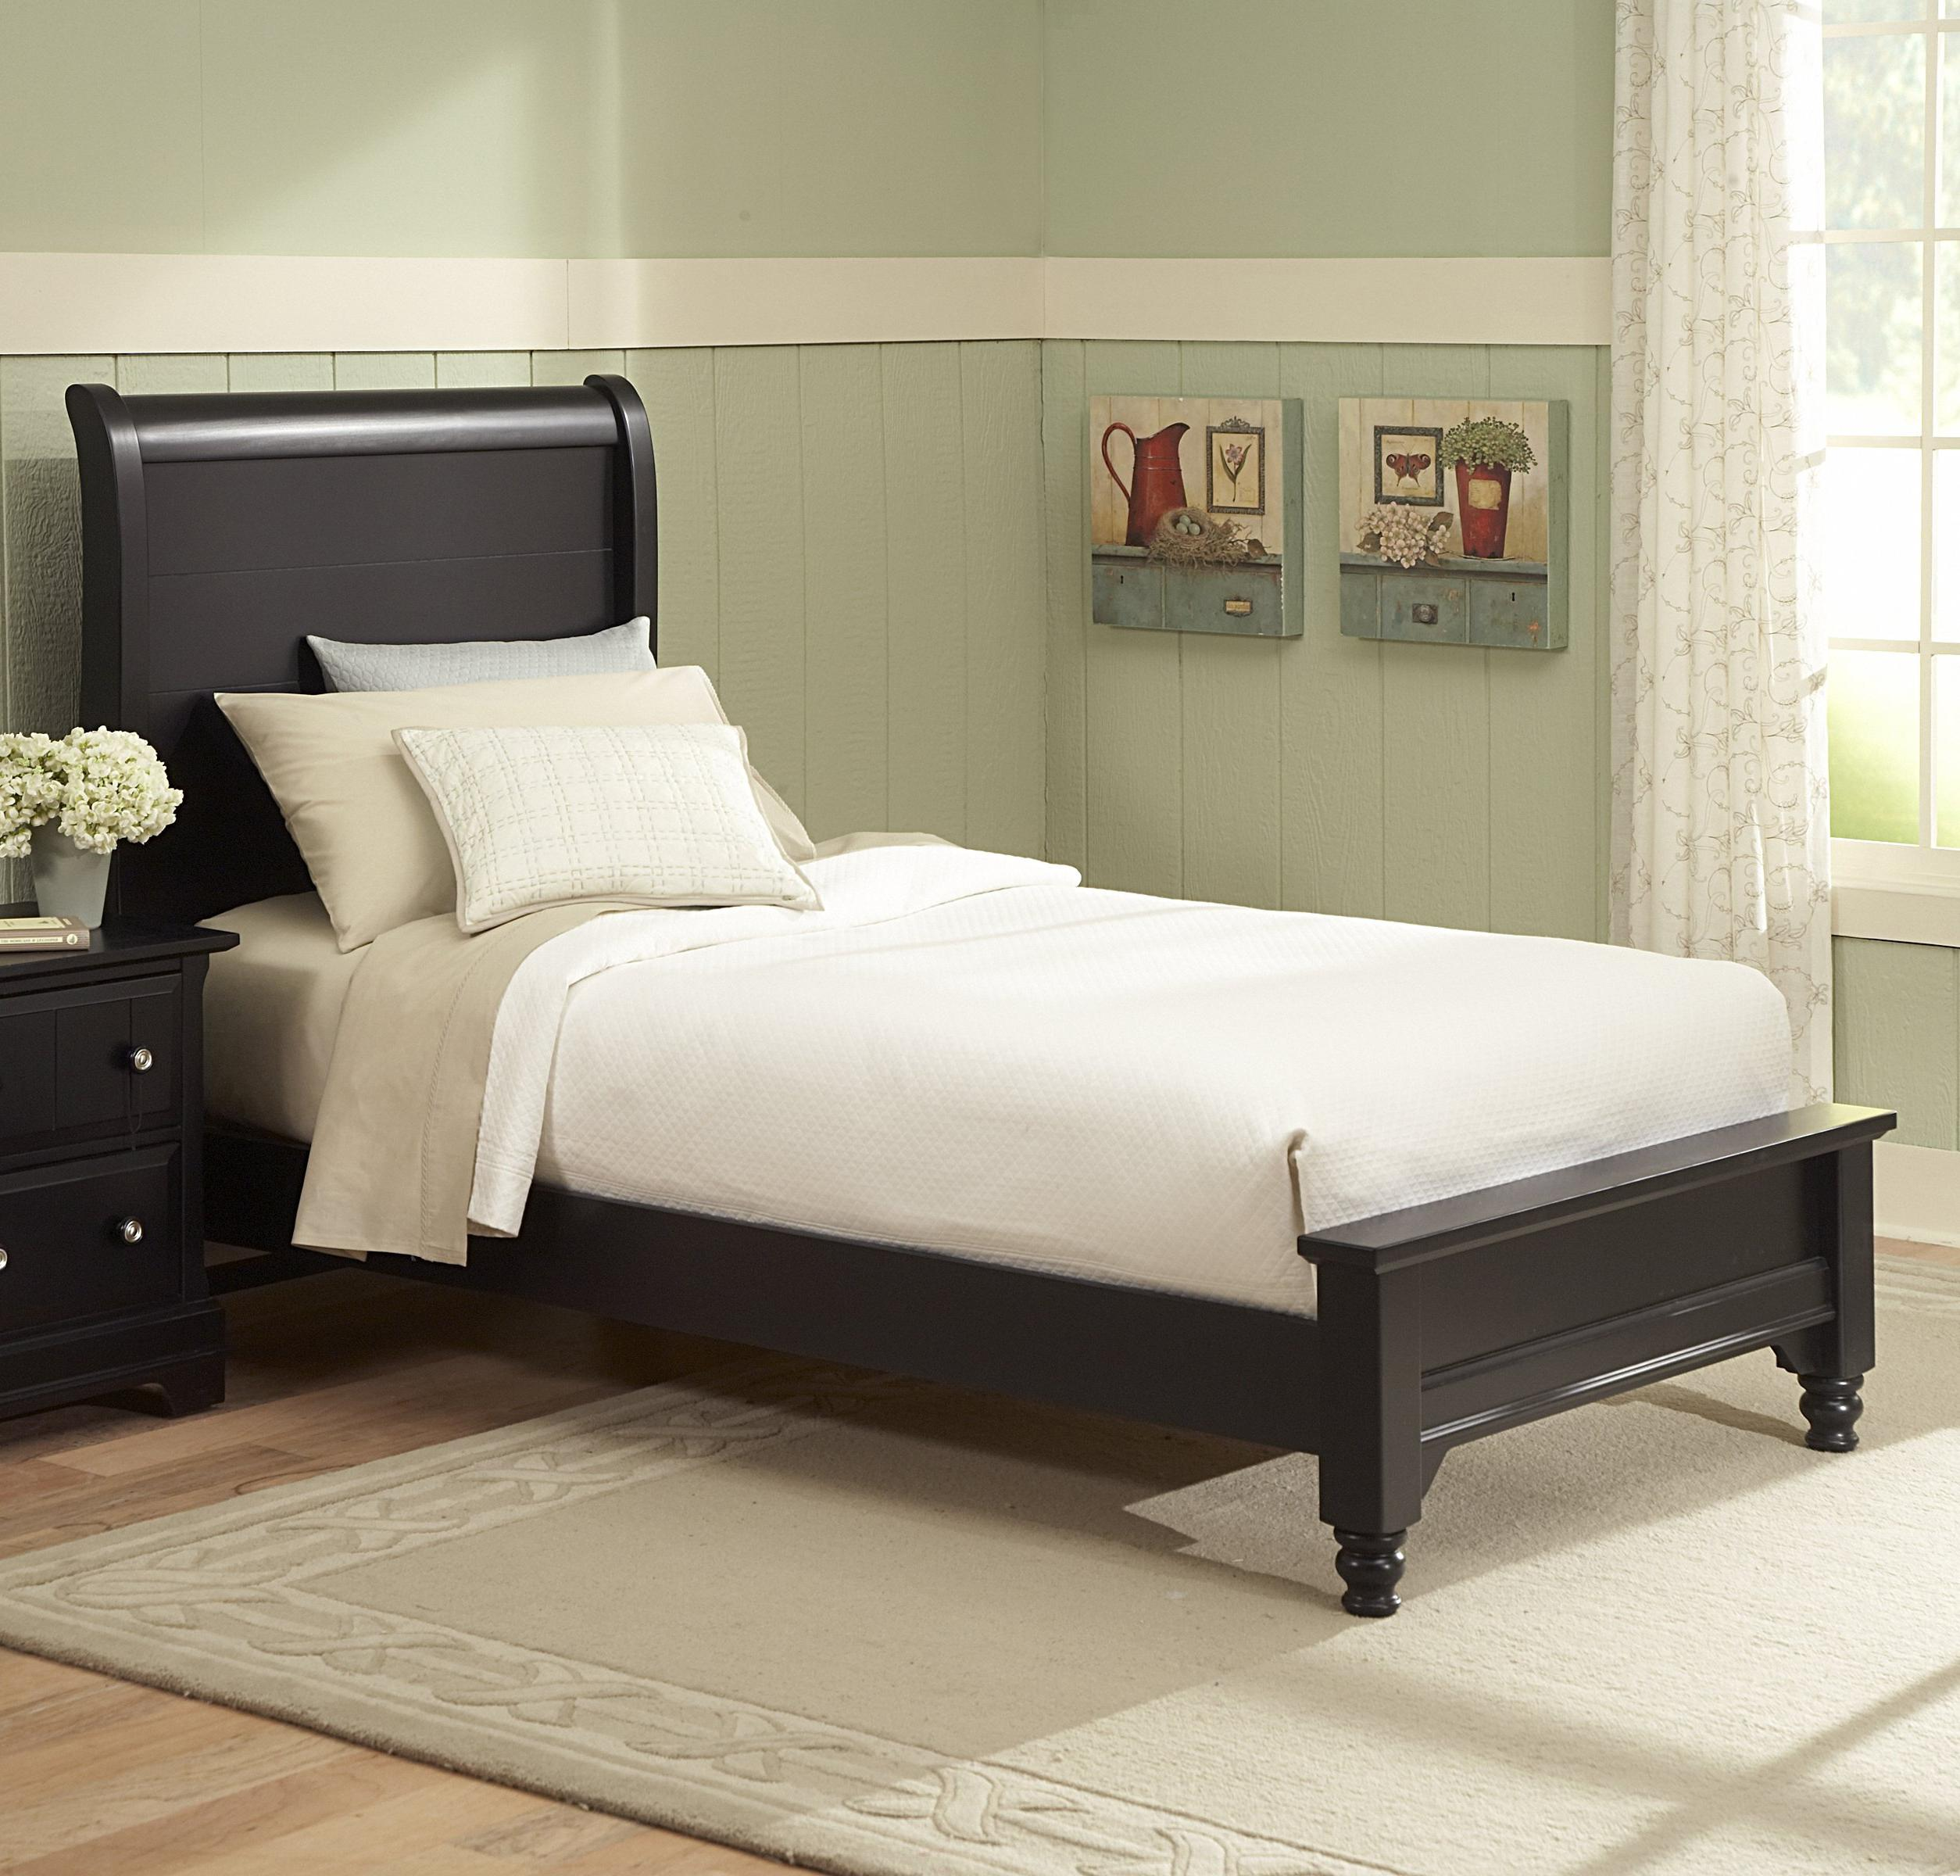 Vaughan bassett cottage queen sleigh bed w low footboard for Queen footboard